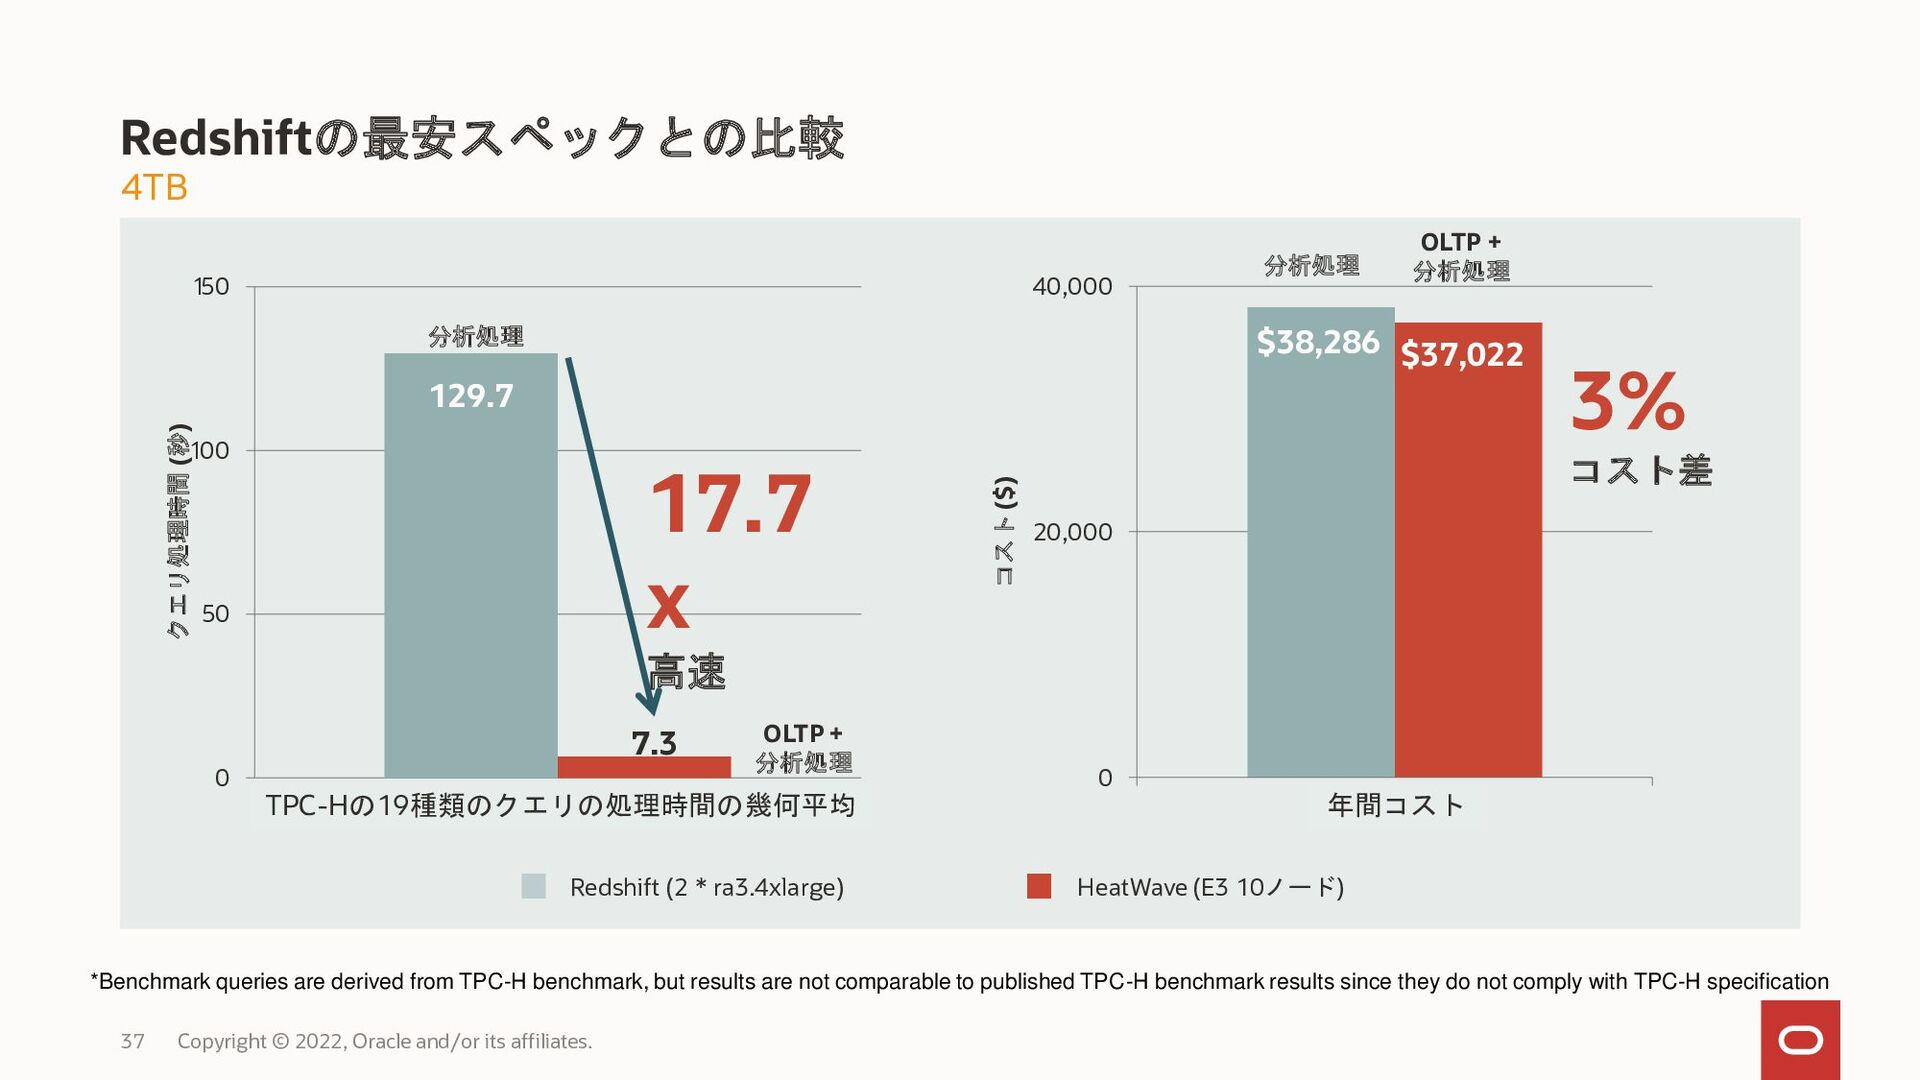 """HeatWave ETL SQL 後藤 良彦 合同会社DMM.com ITインフラ本部 イン..."